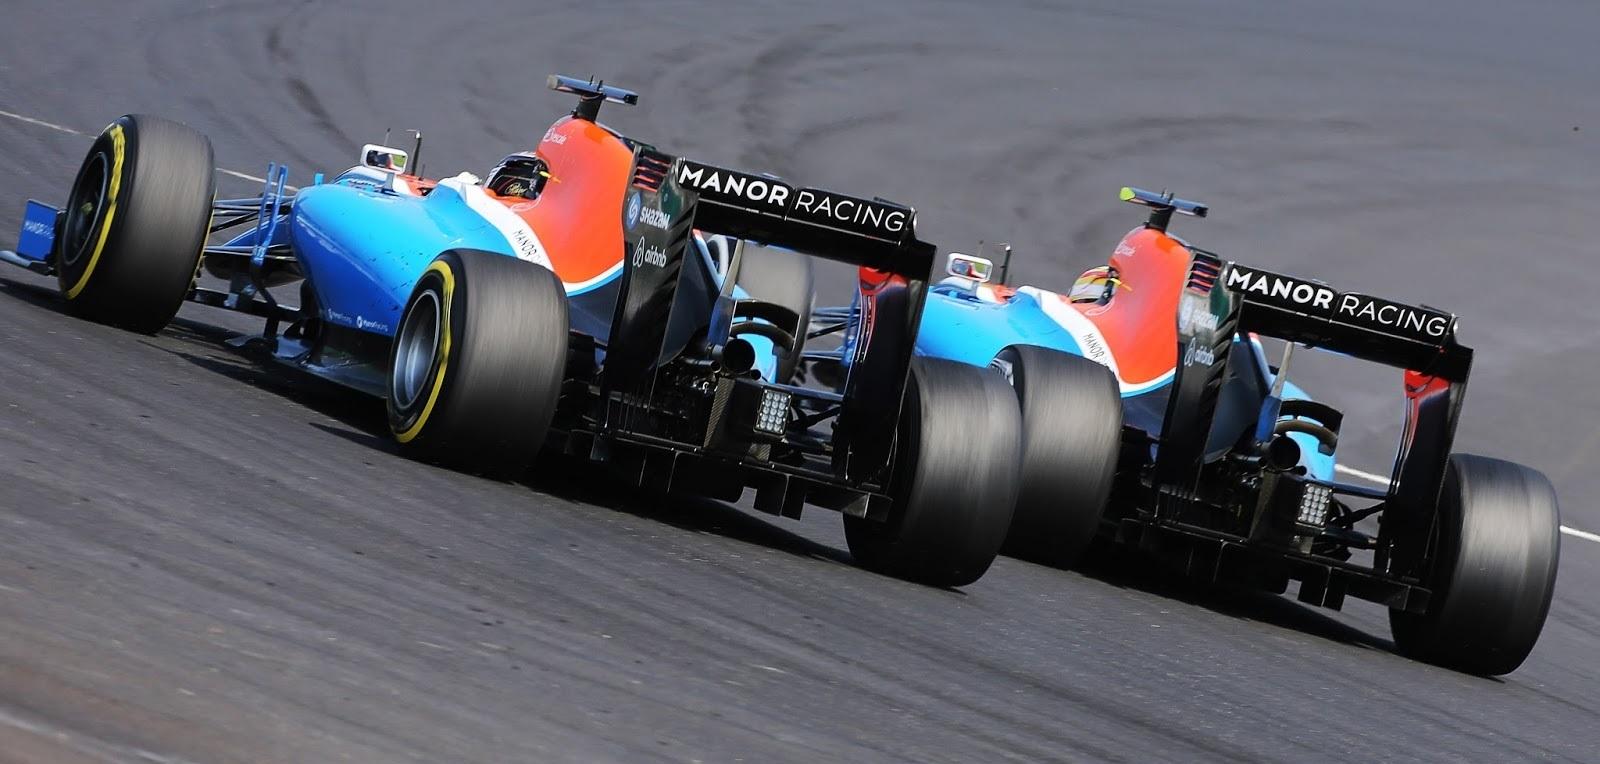 Manor 2016 F1